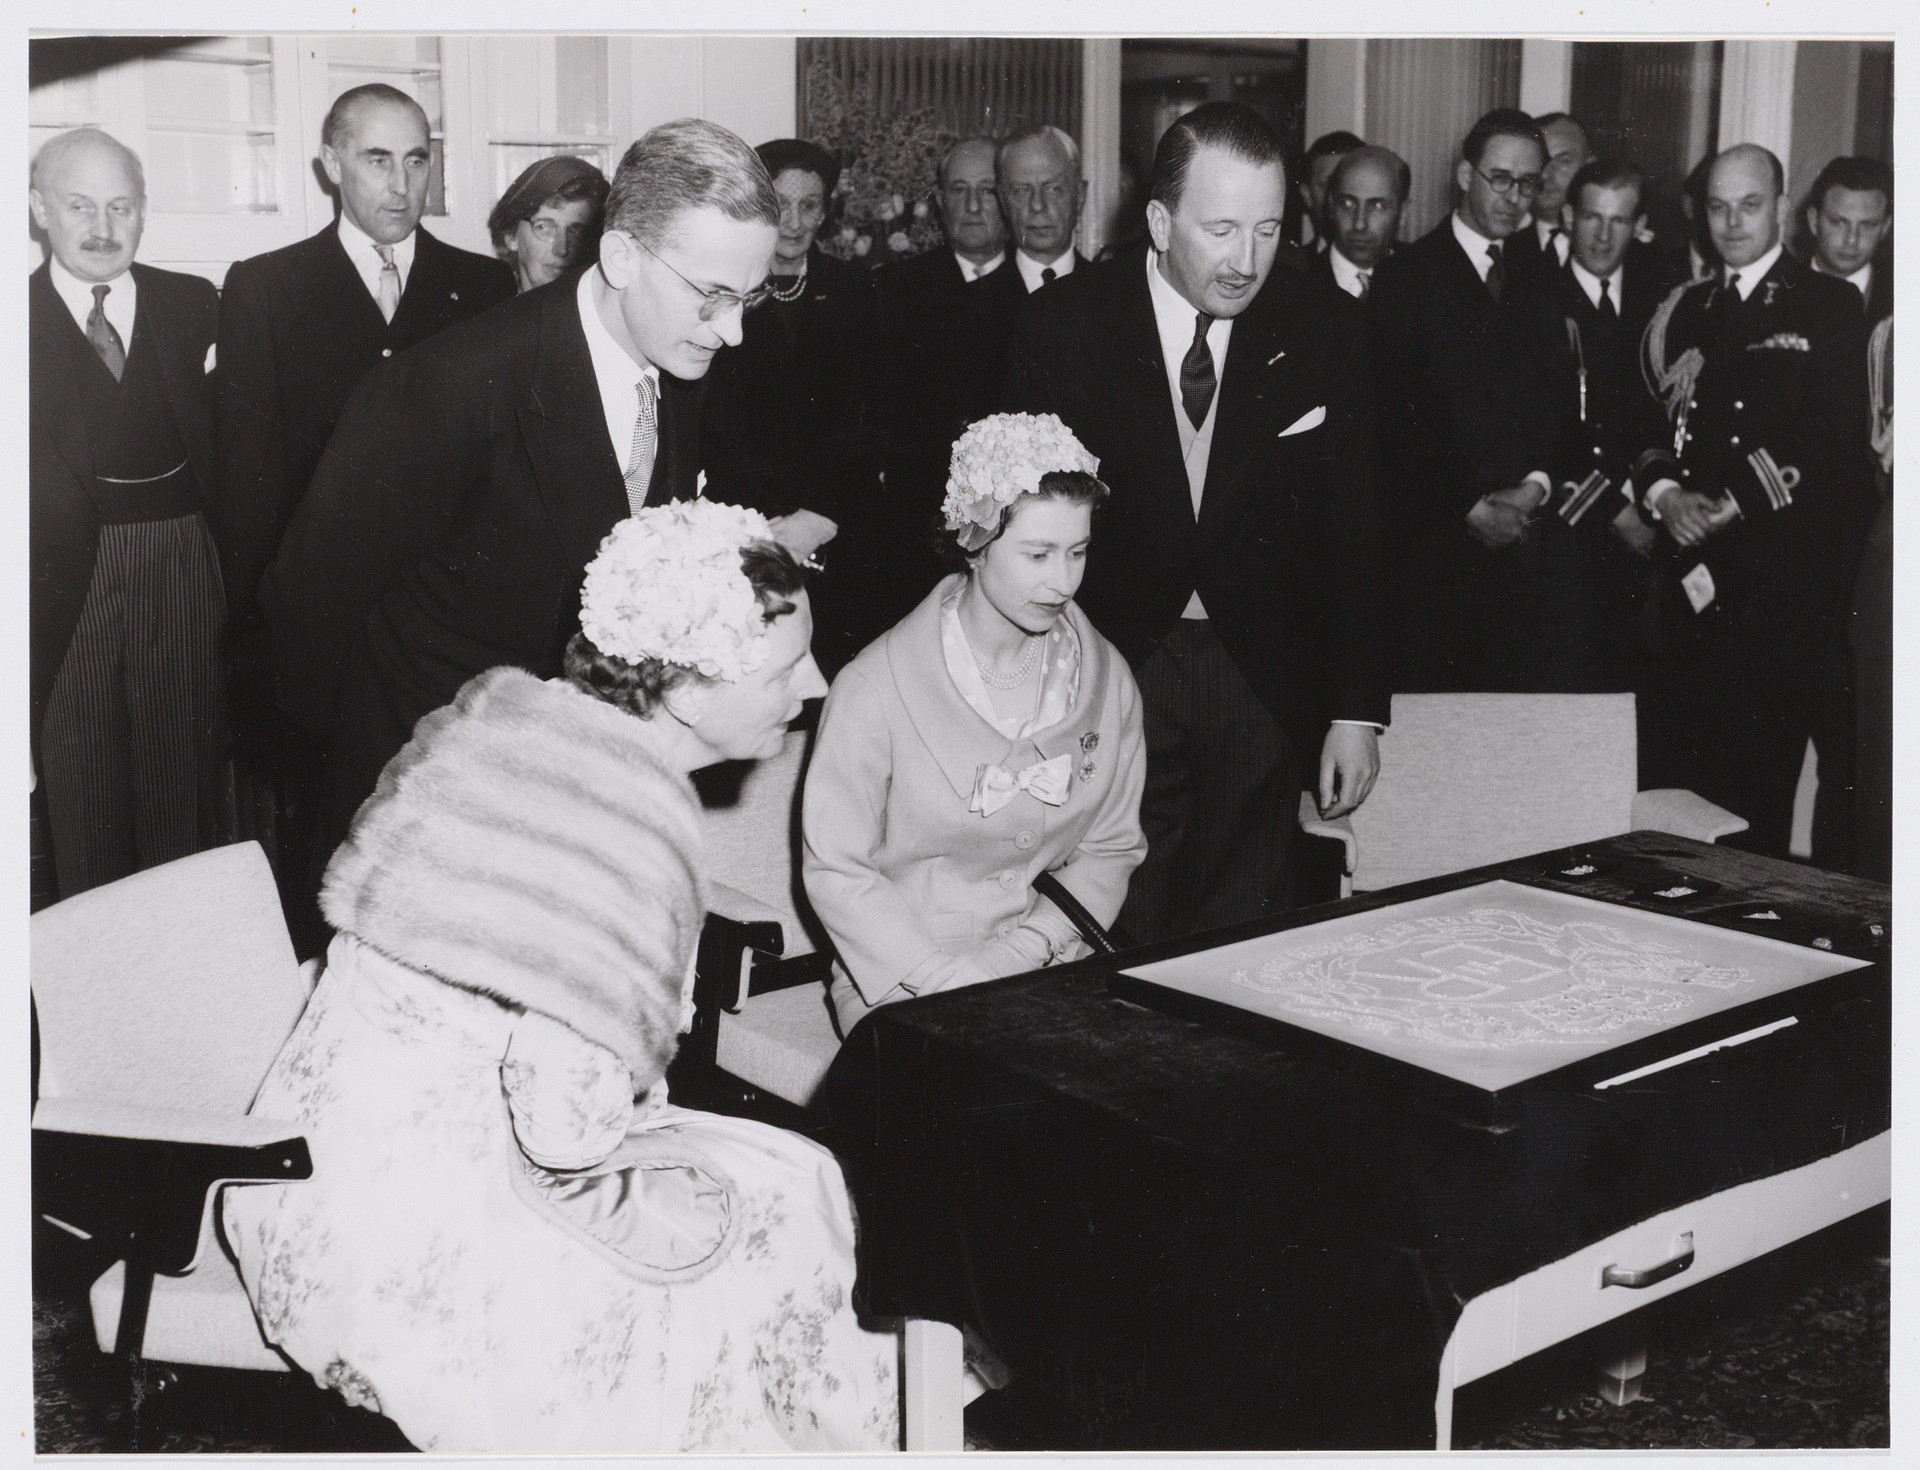 Visit by Queen Elisabeth and Koningin Juliana